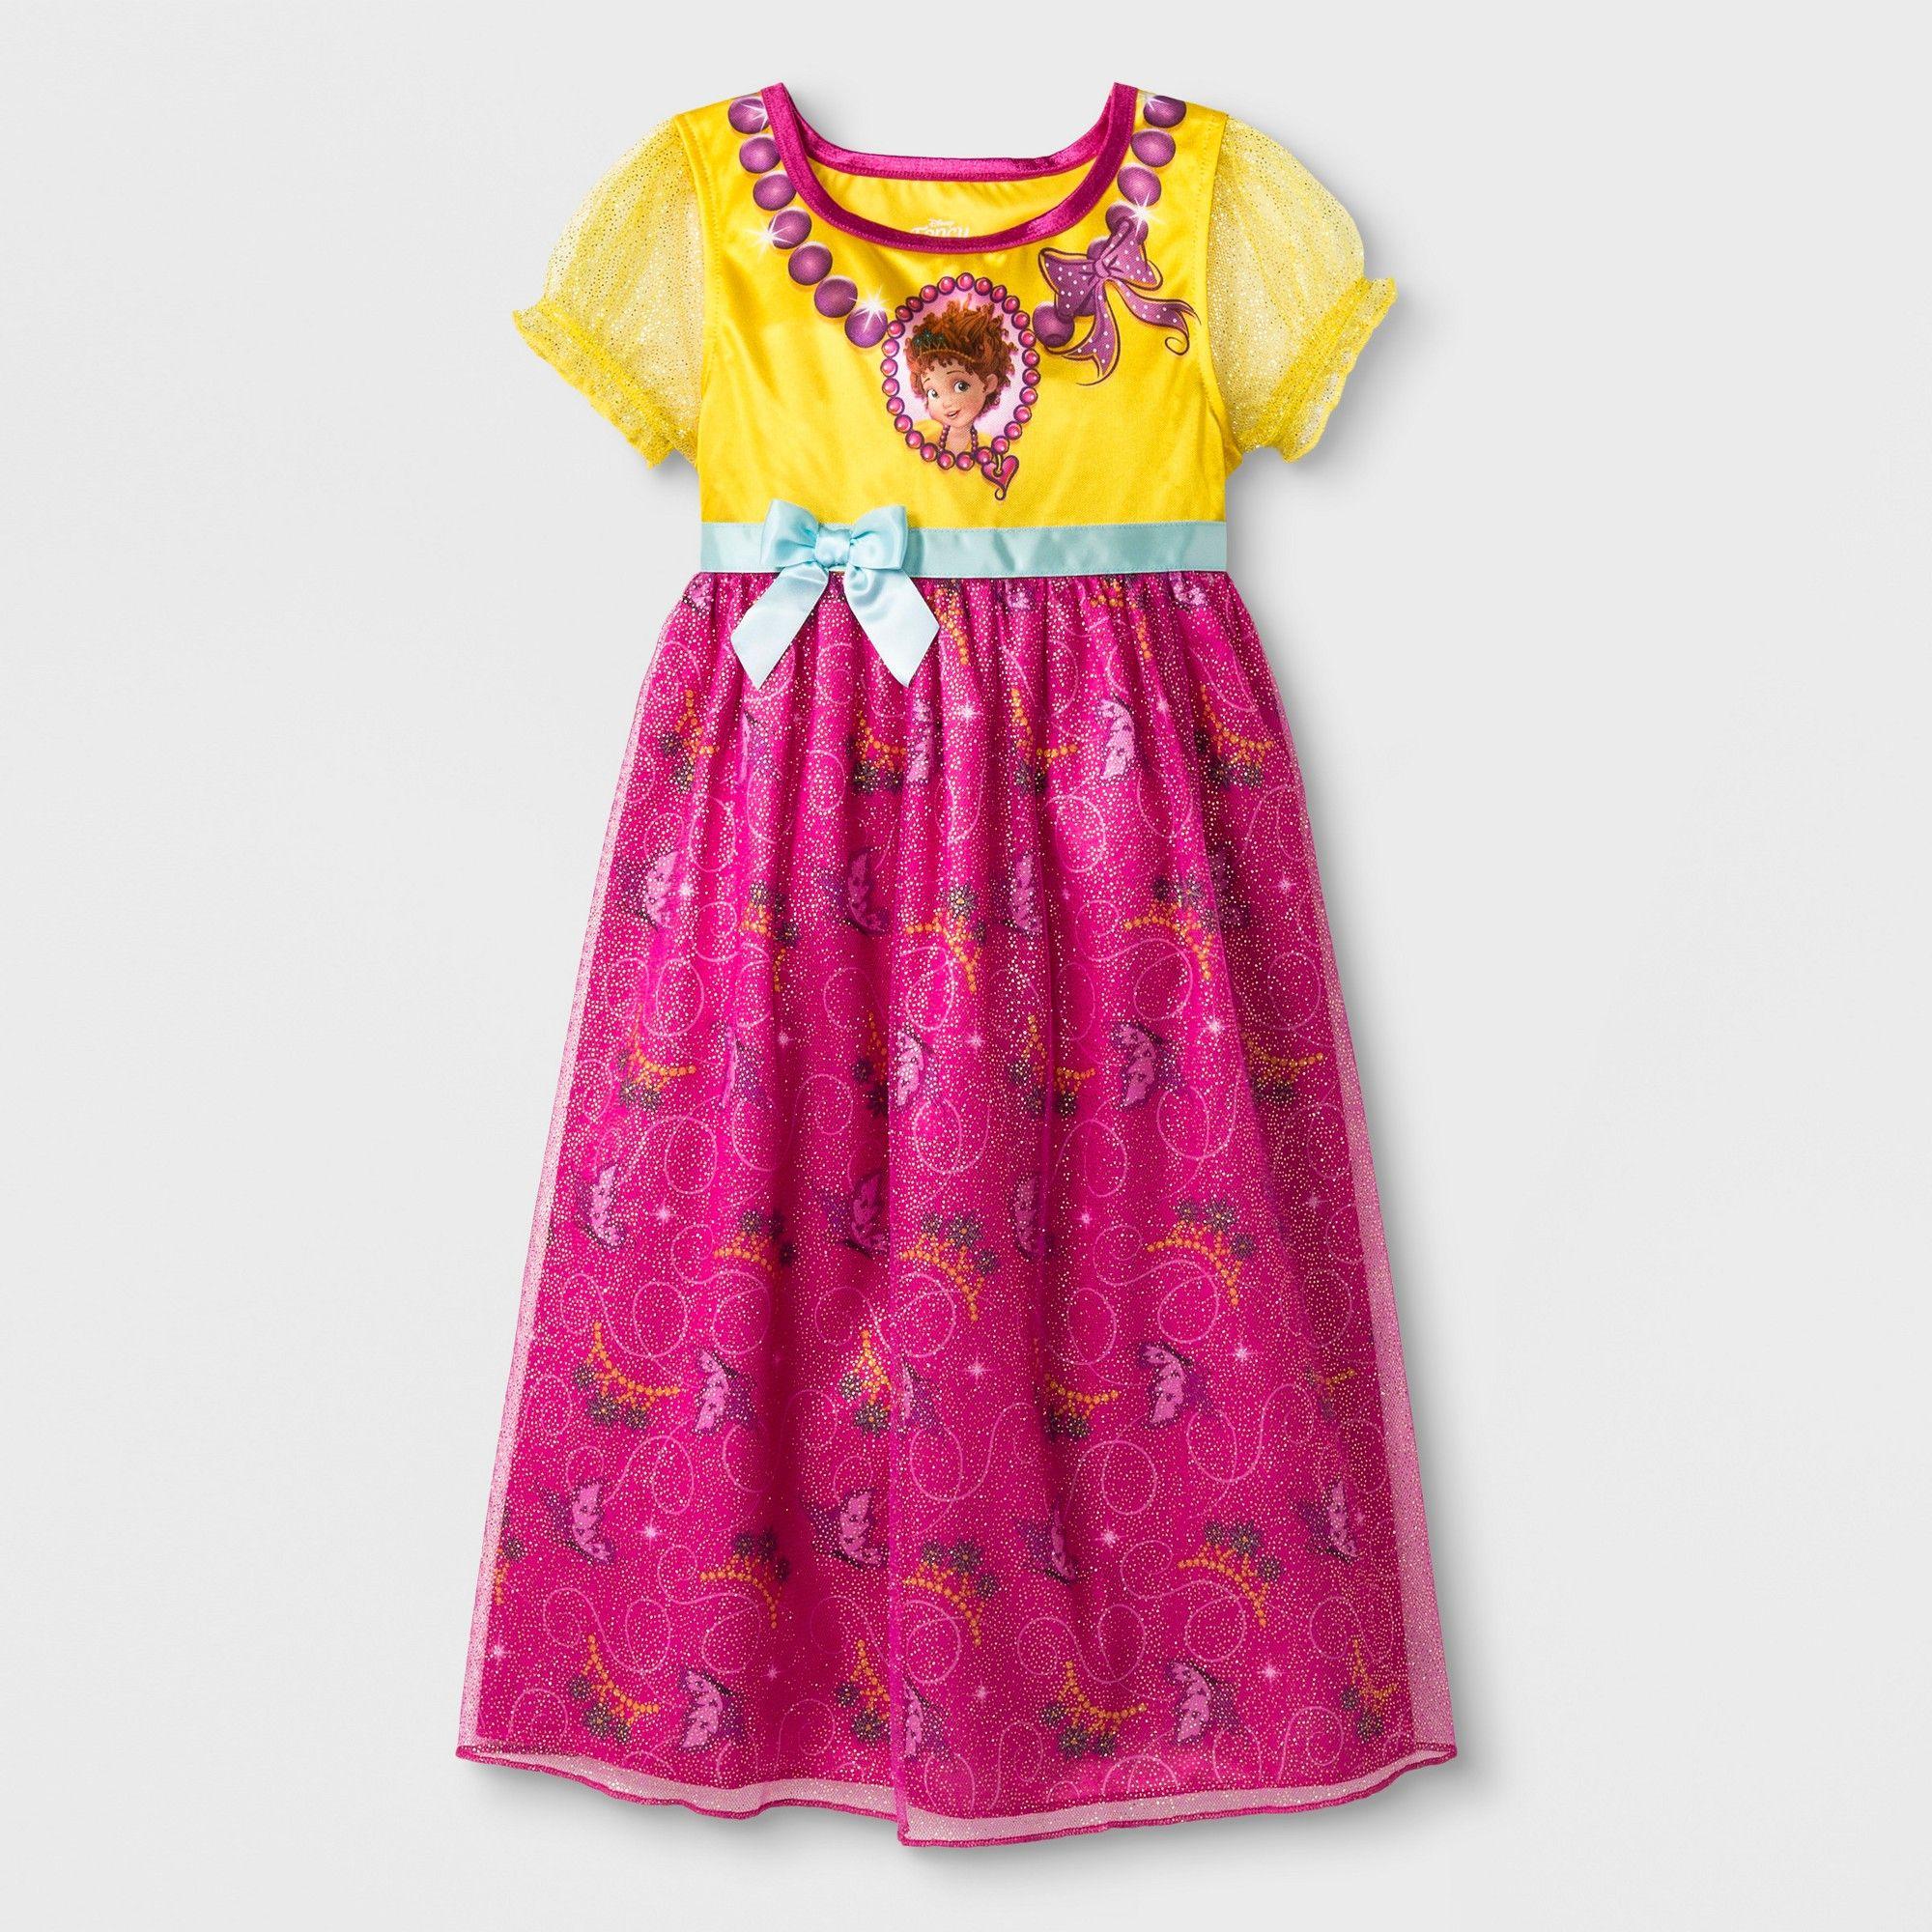 61ea030661bb Toddler Girls  Fancy Nancy Nightgown - Yellow 3T